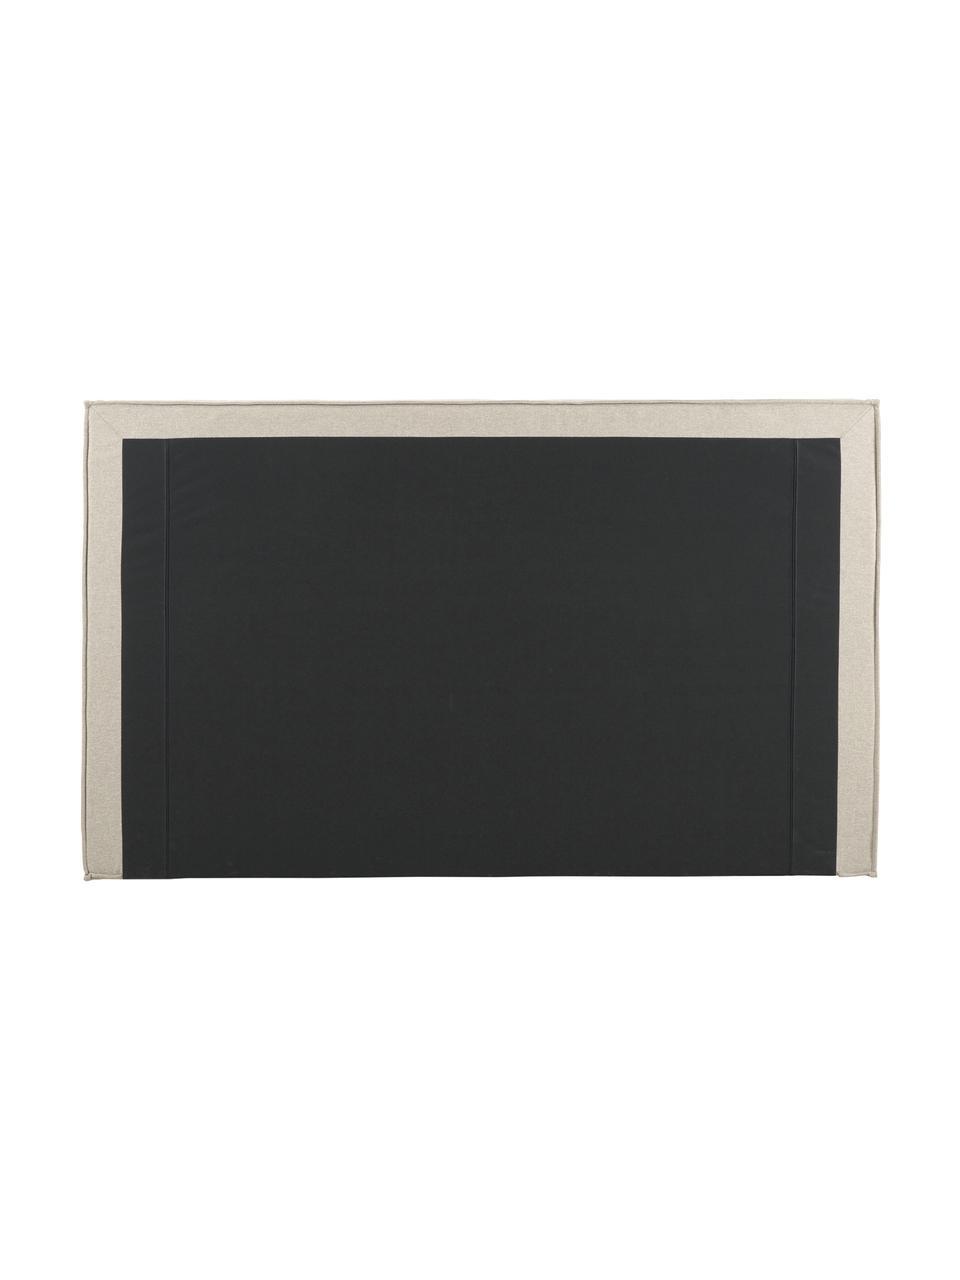 Gestoffeerd bed Dream met opbergruimte in donkere beige, Frame: Massief grenenhout en pla, Bekleding: 100% polyester (gestructu, Stof taupe, 180 x 200 cm